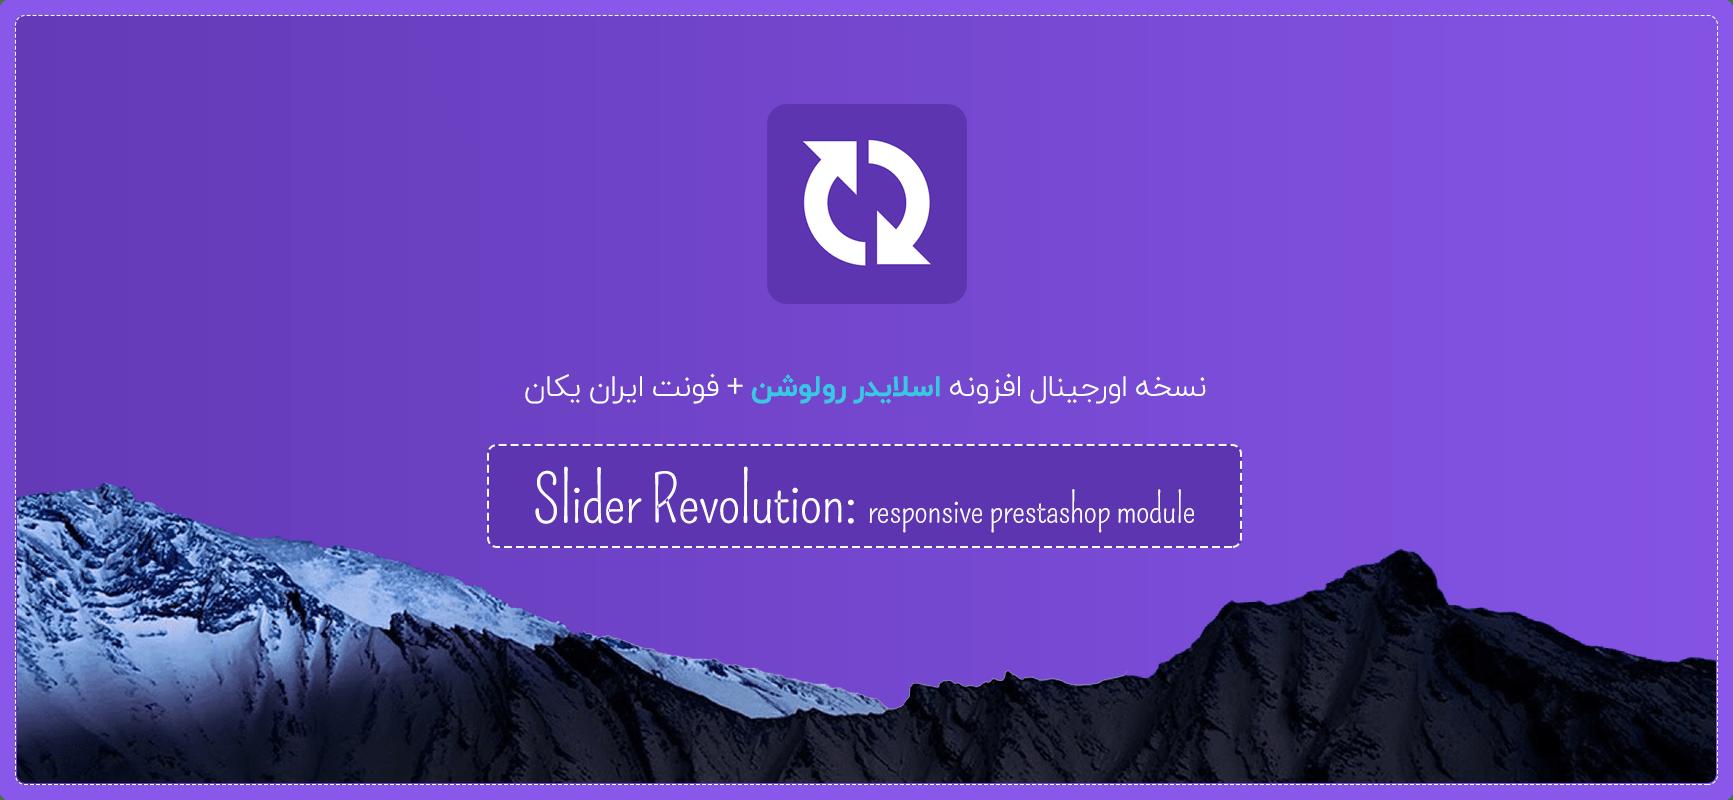 slider revolution responsive prestashop ماژول اسلایدر رولوشن پرستاشاپ